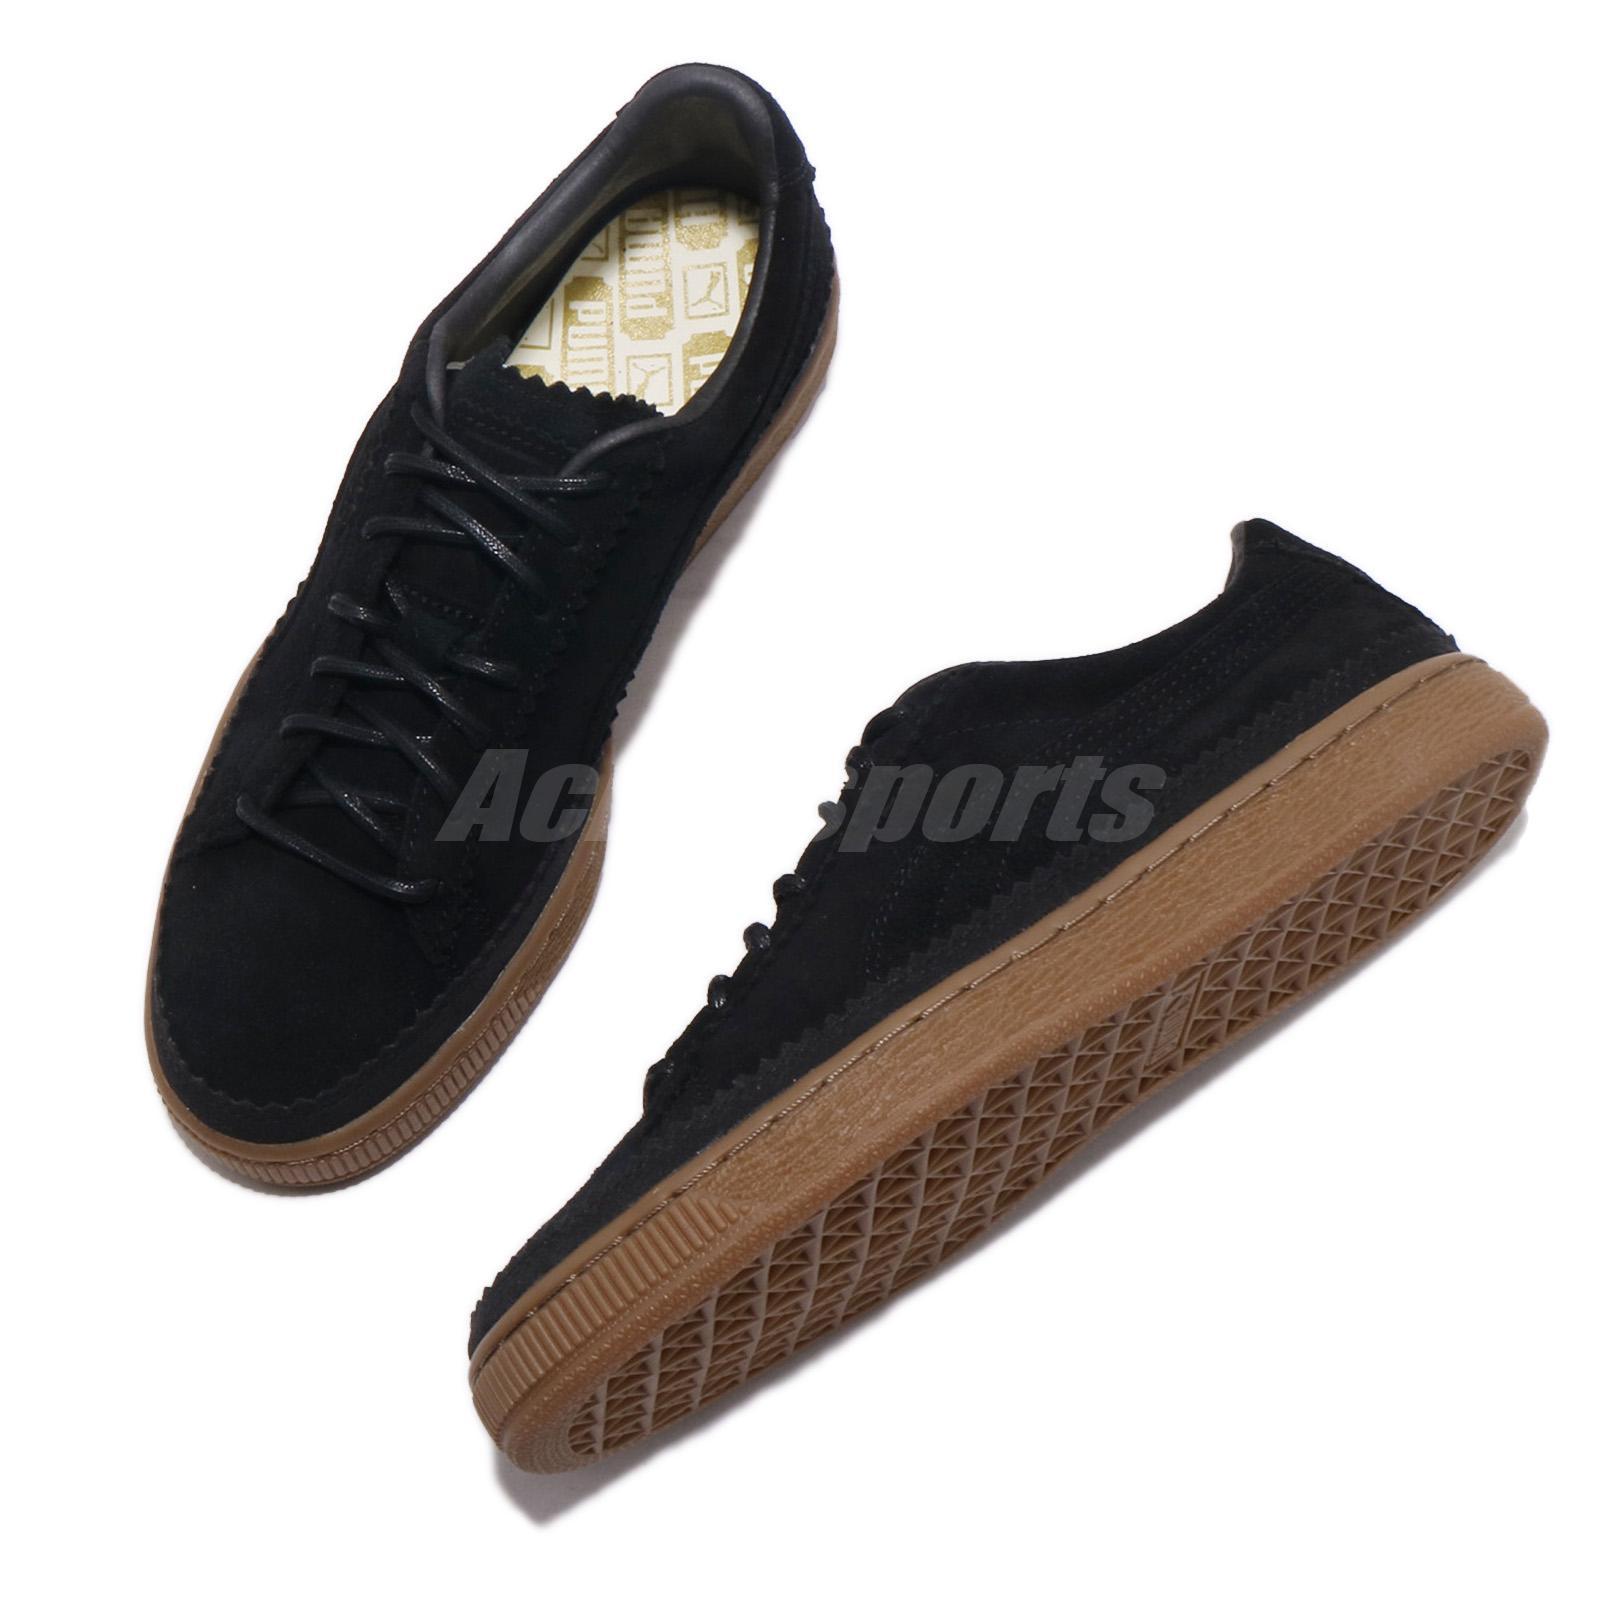 PUMA Suede Classic Brogue Herren Freizeit Low Top Sneaker Schuhe 366631-03 neu